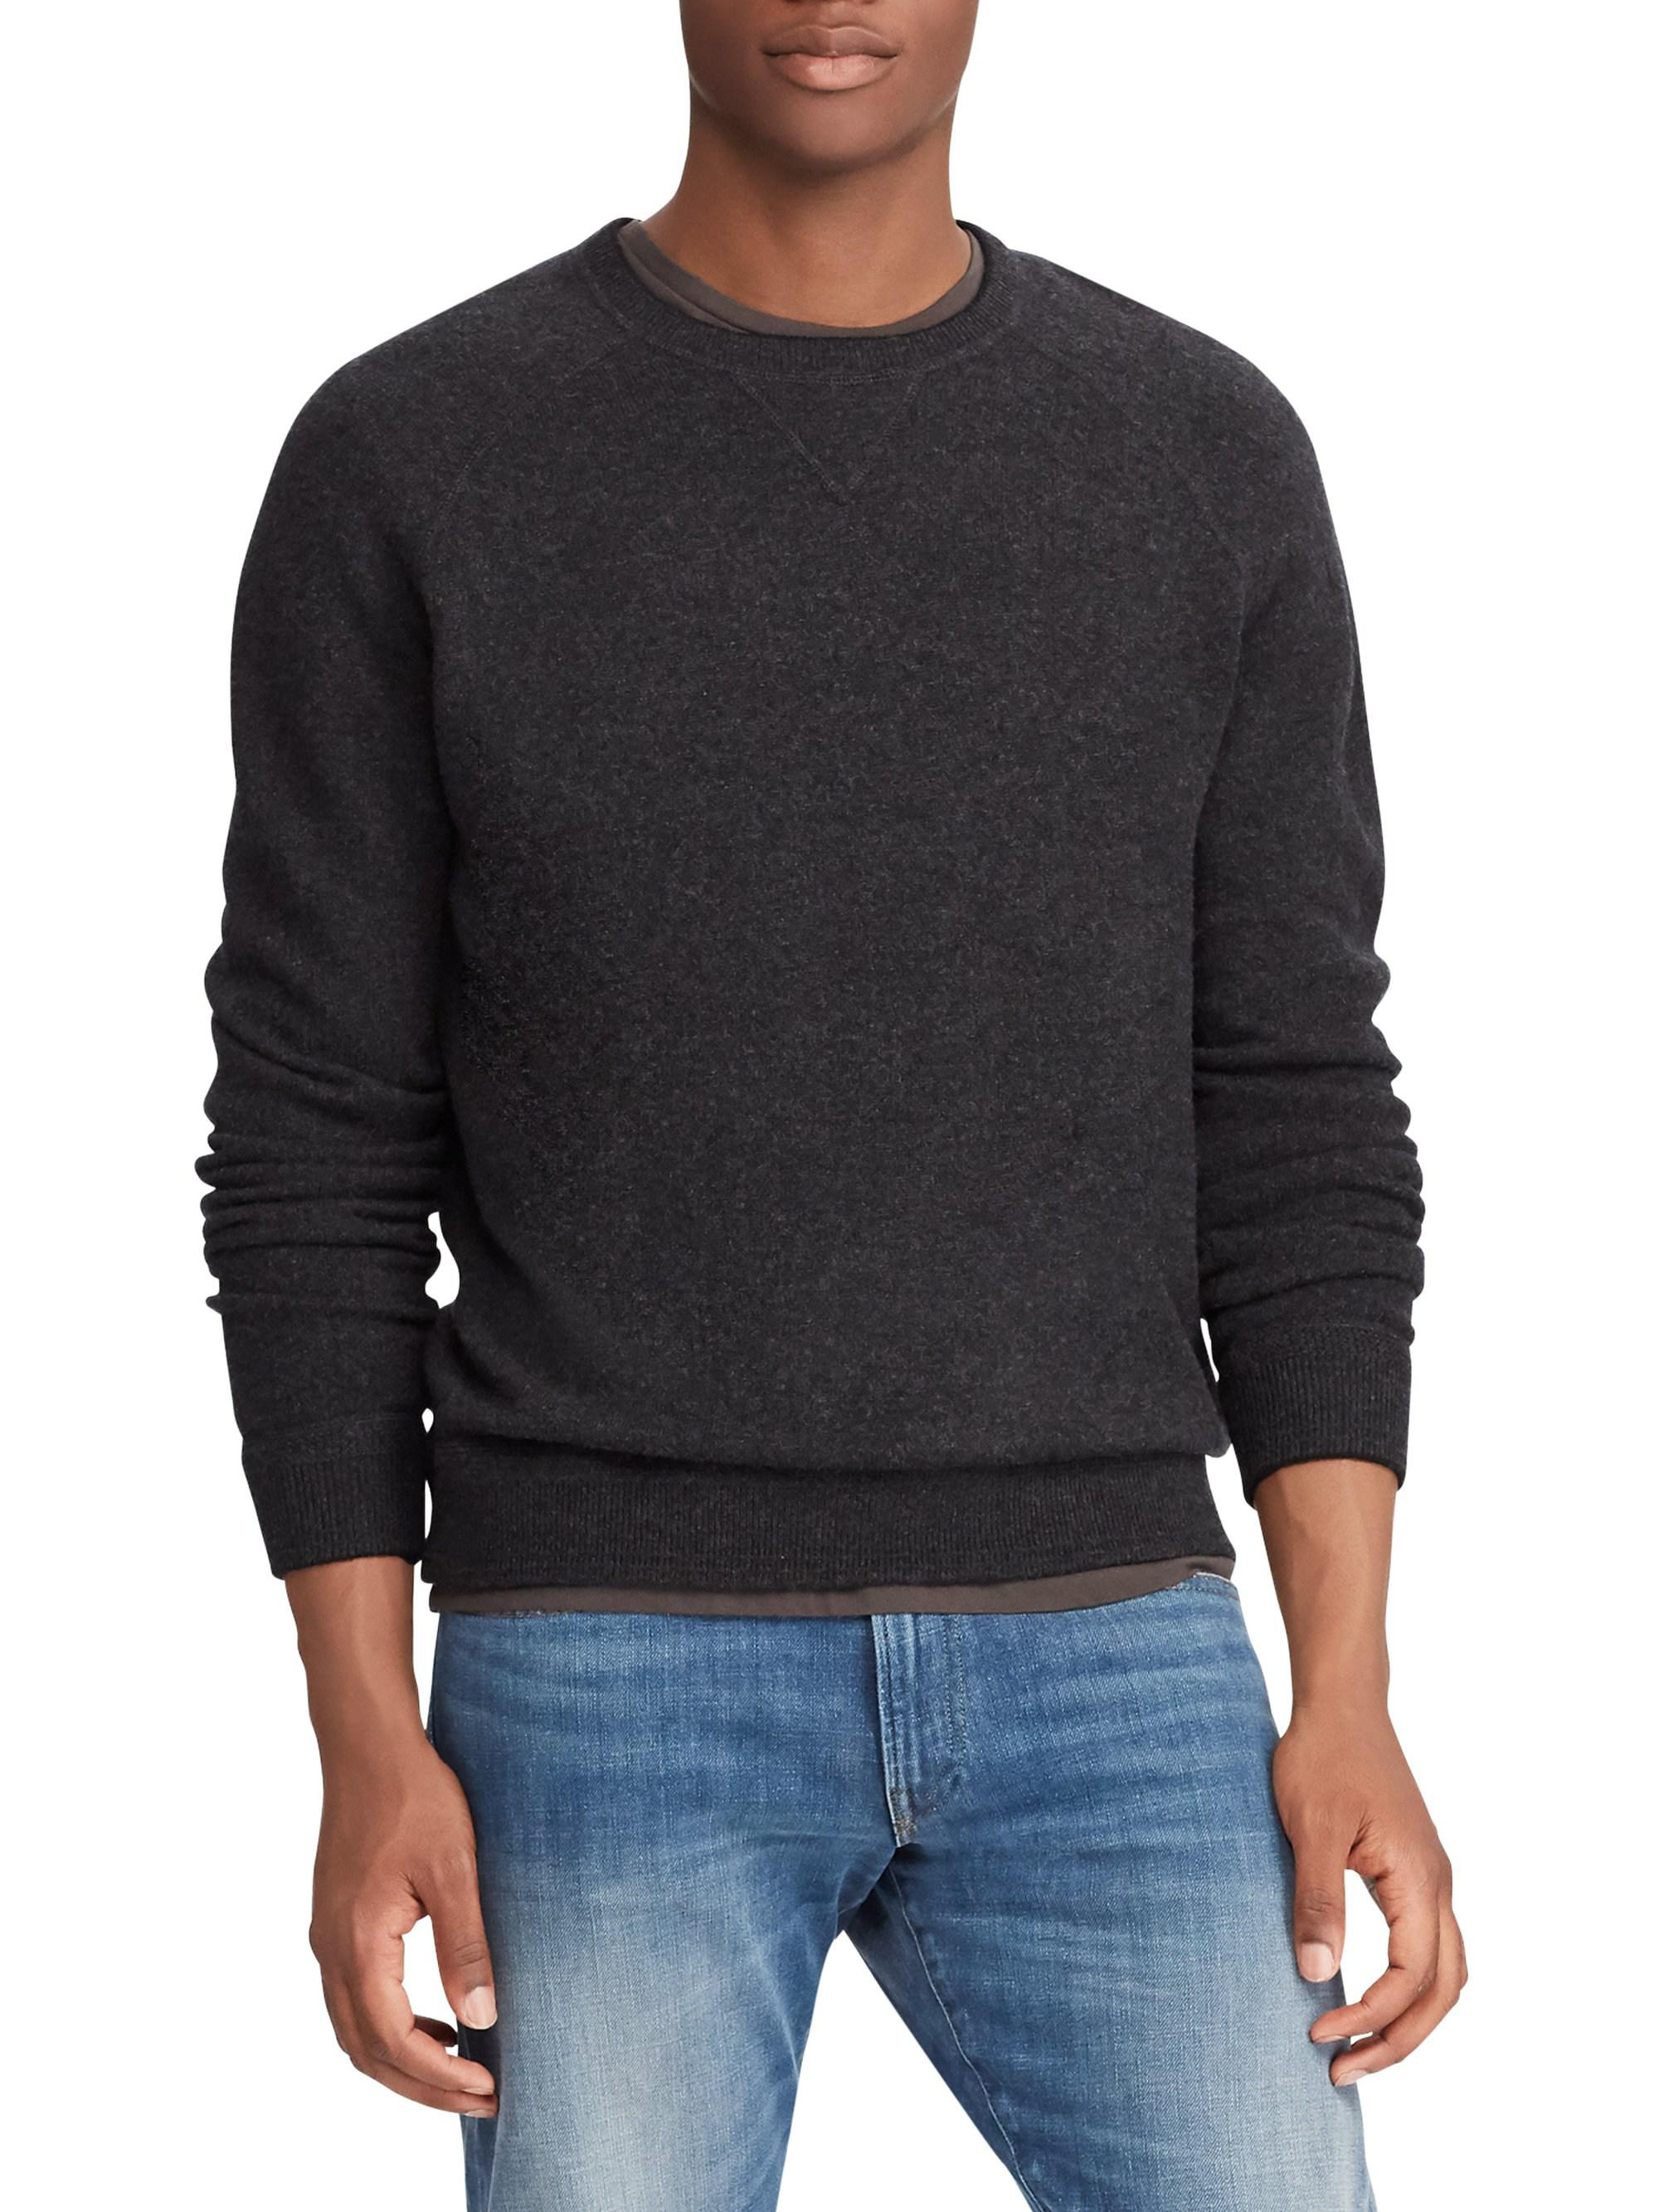 e2f4c8e7996 Polo Ralph Lauren. Men s Black Loryelle Classic-fit Wool Long-sleeve  Sweatshirt